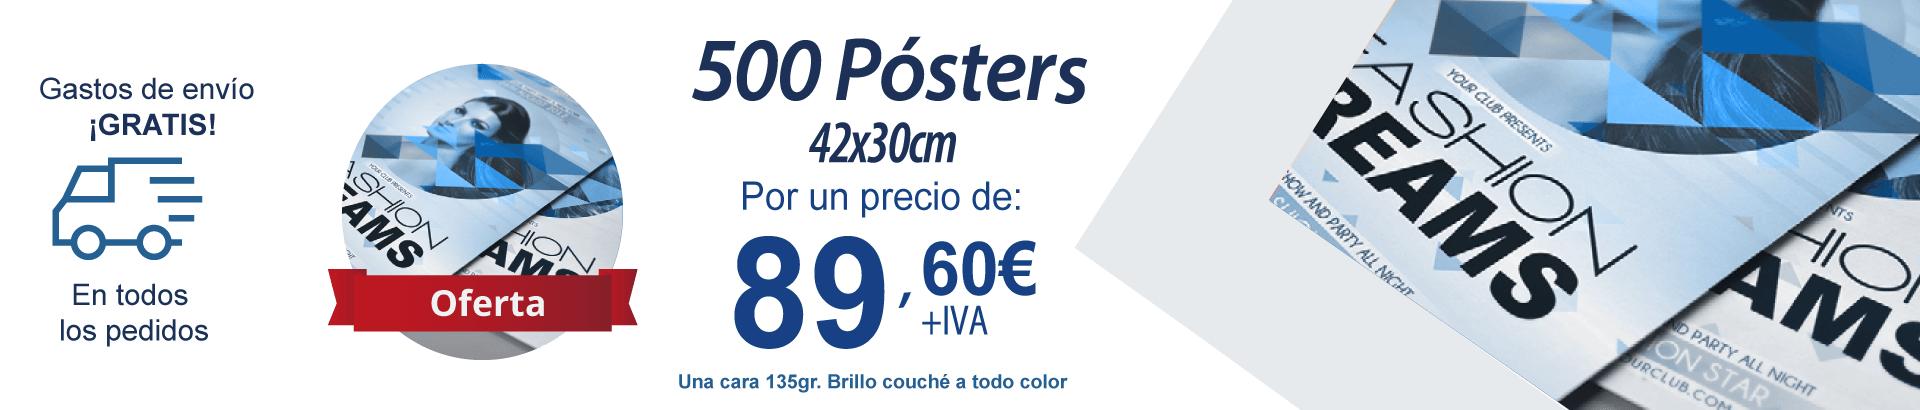 Impresión de posters online